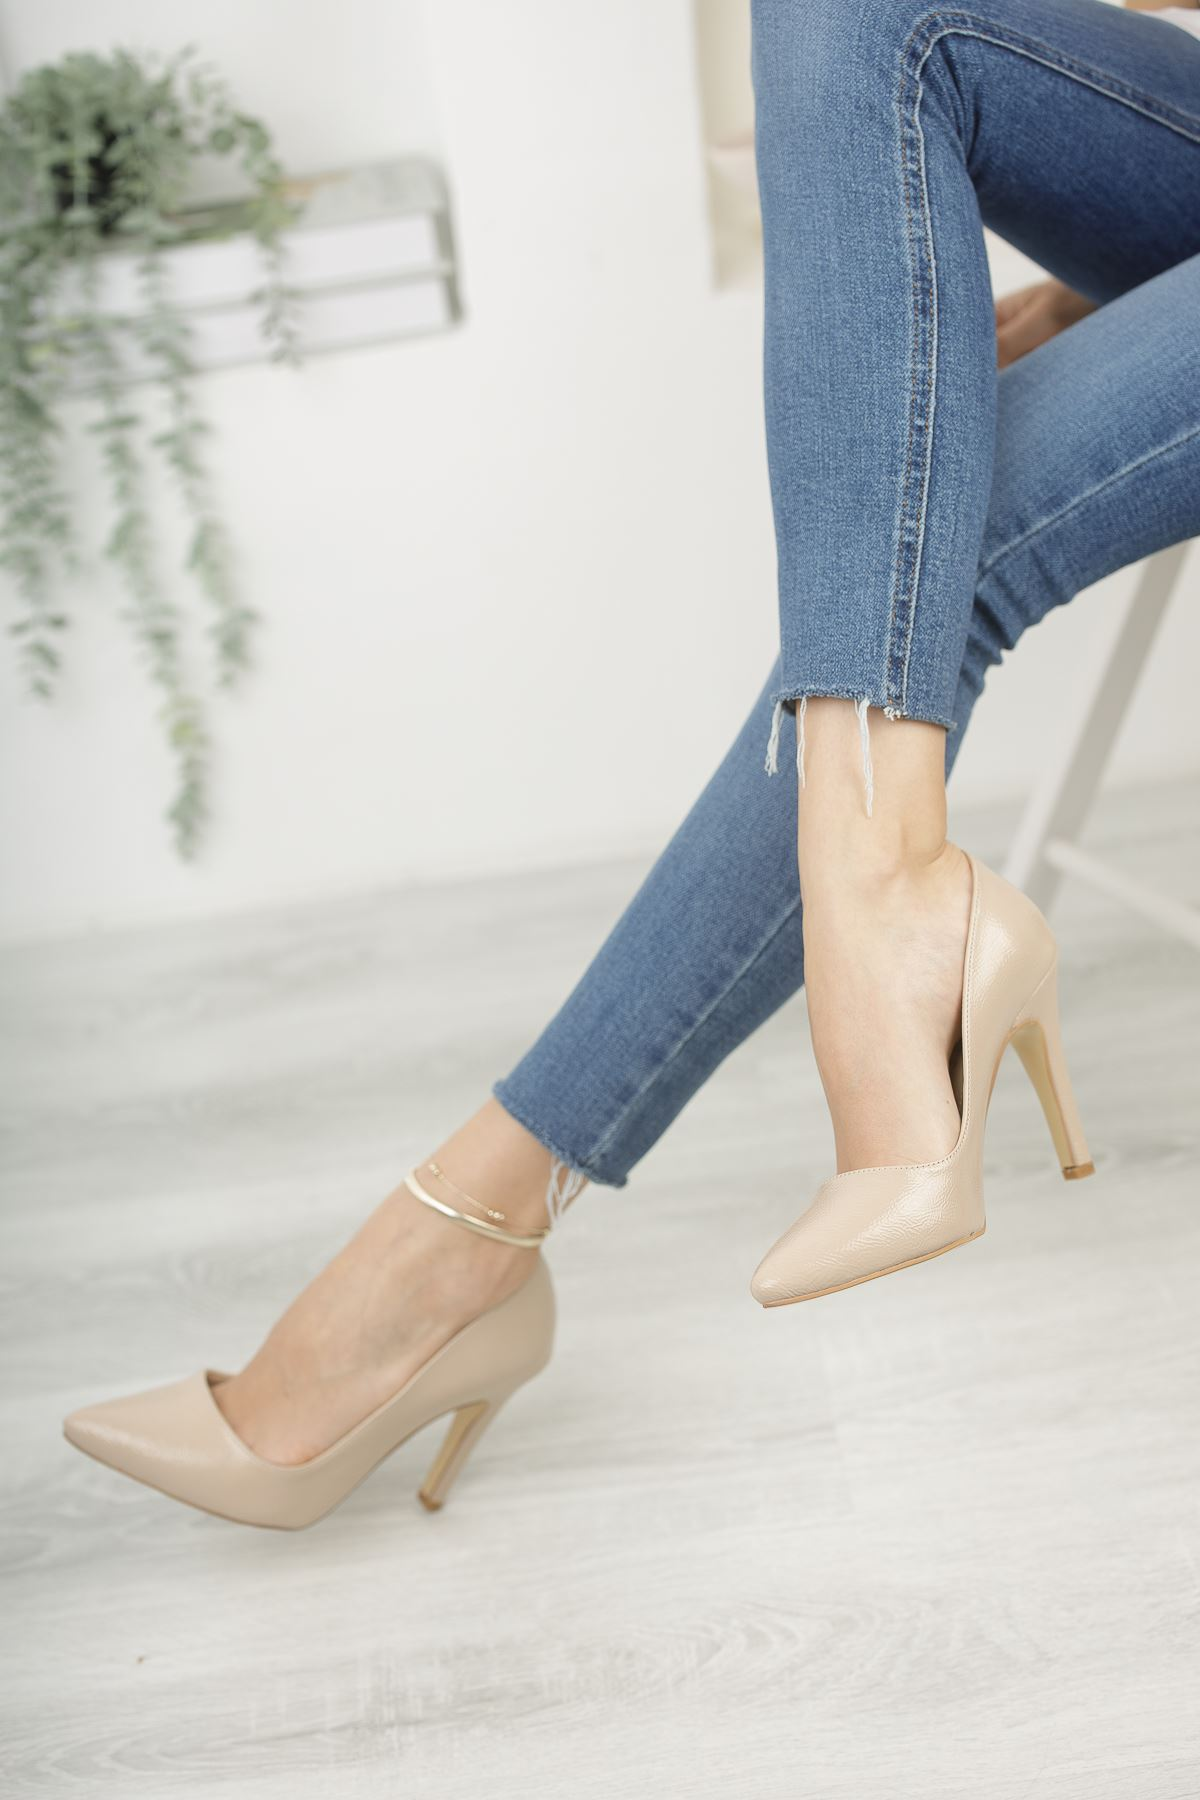 Mariam Vizon Kırışık Rugan Yüksek Topuklu Stiletto